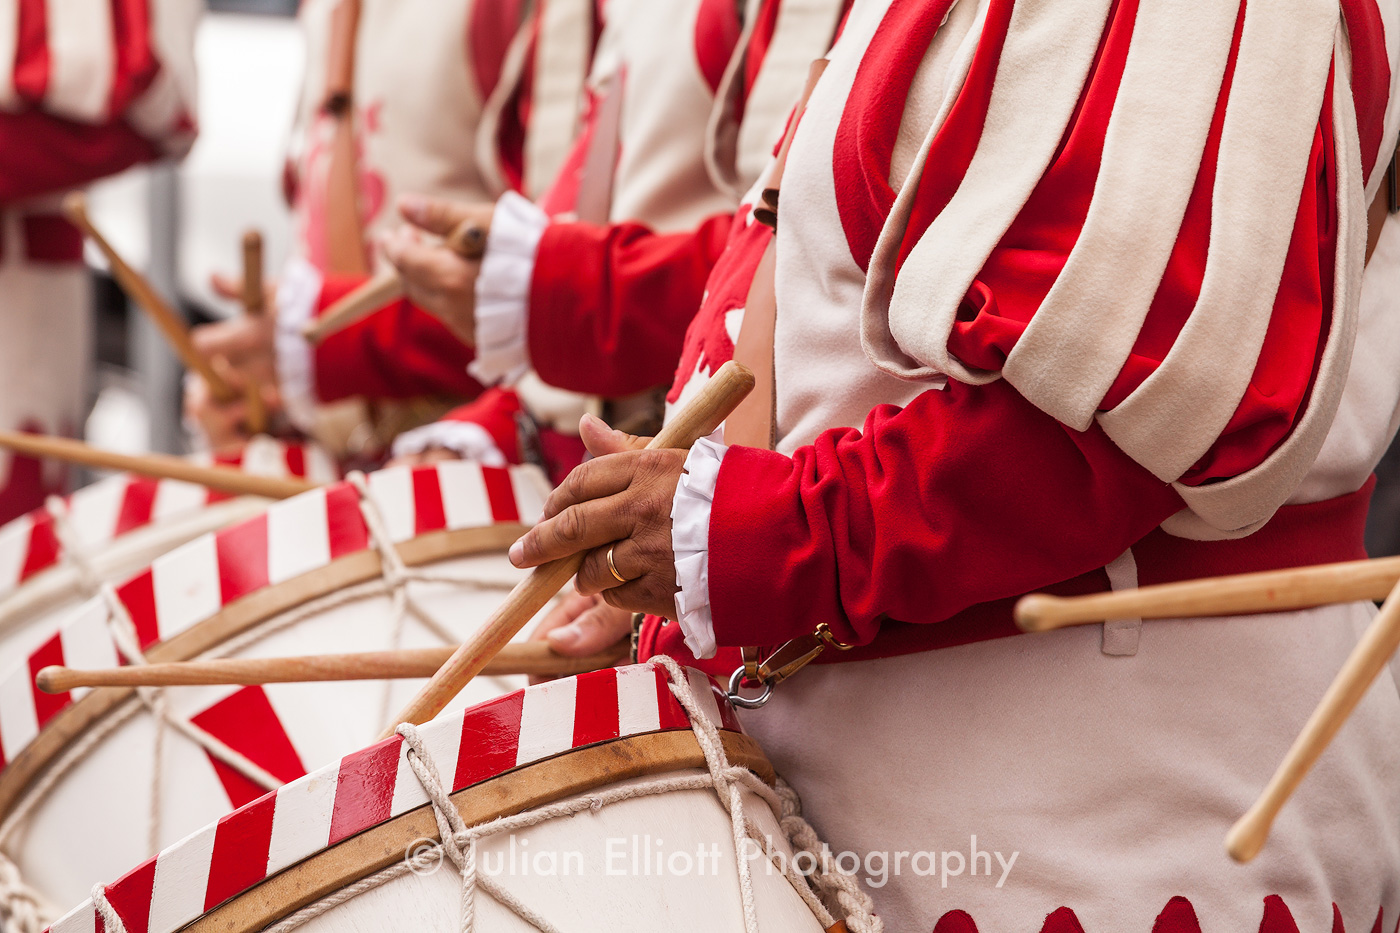 Calcio Storico drummers